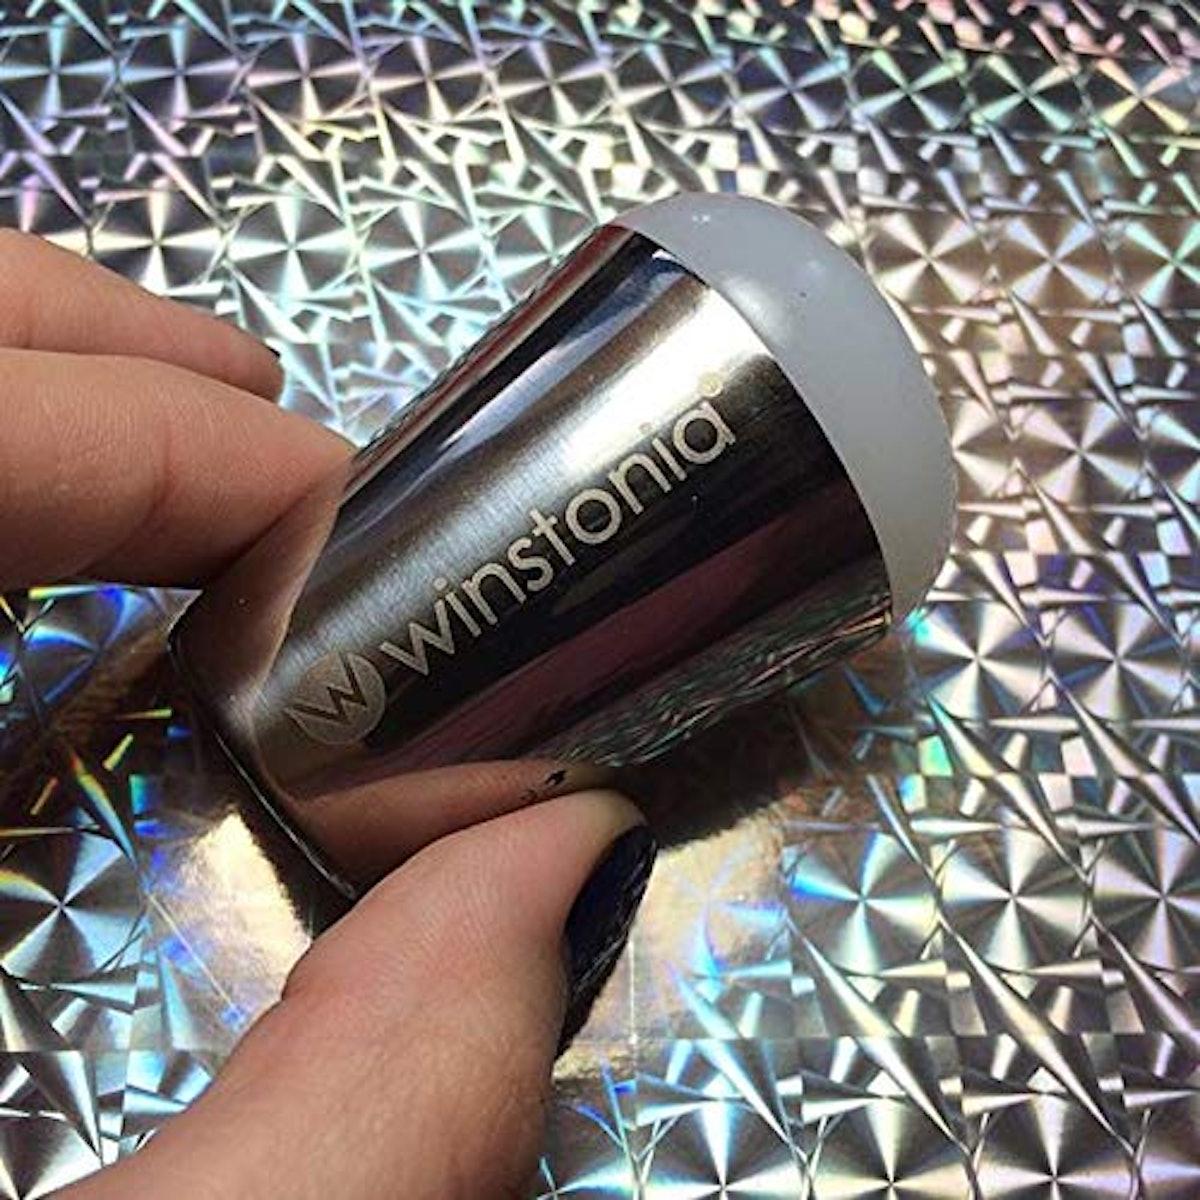 Winstonia Nail Art Stamper, Jumbo Size